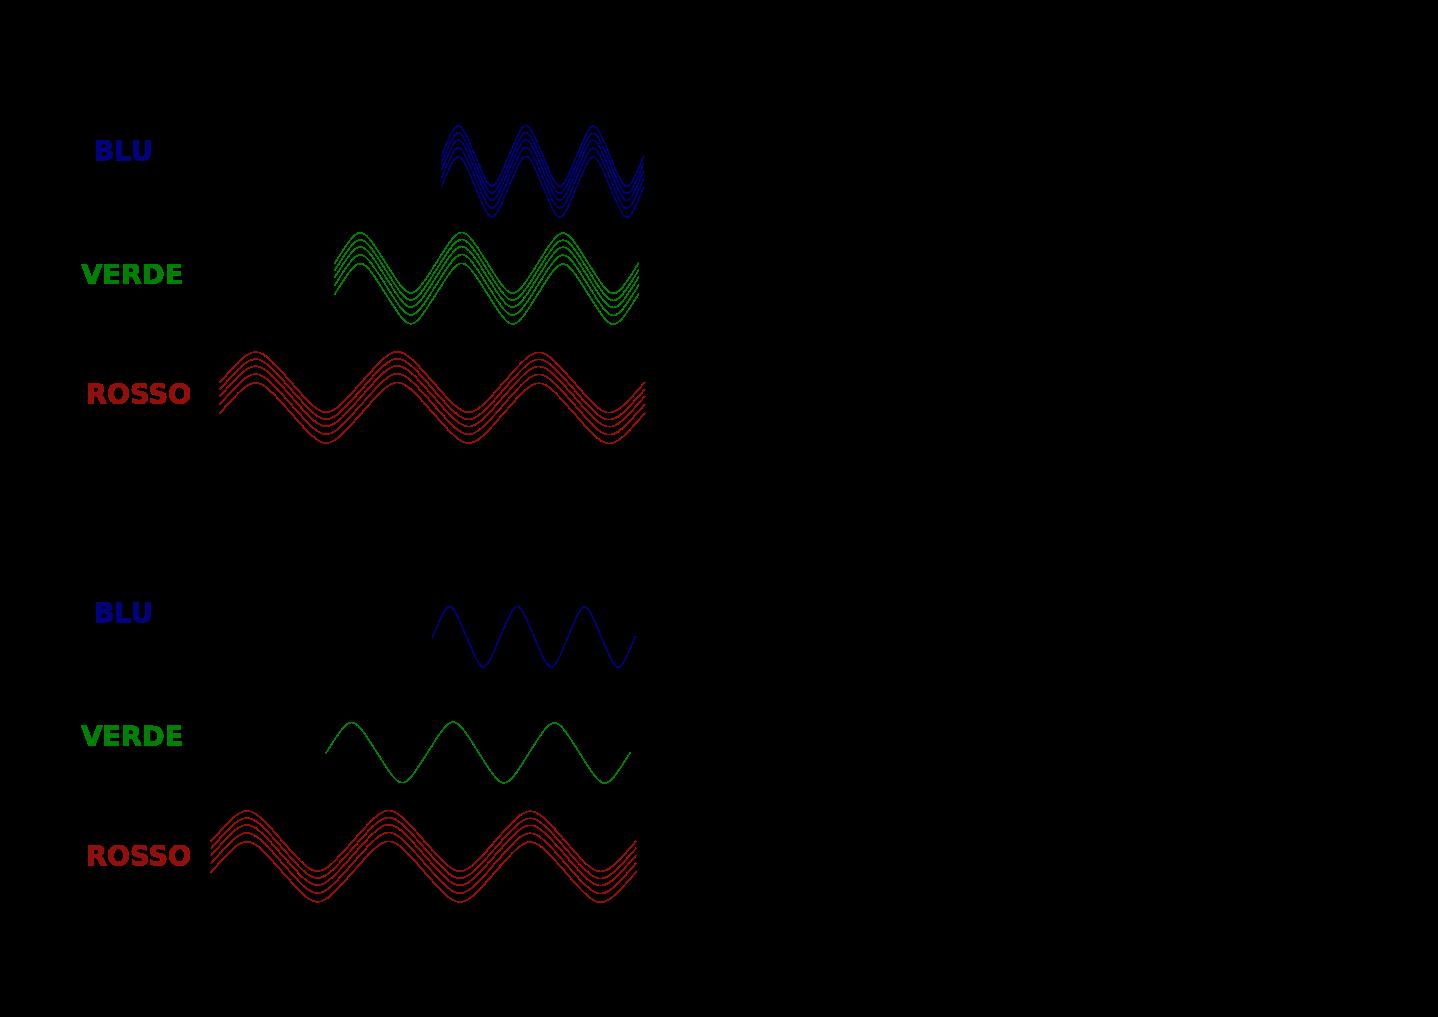 lunghezza d'onda e recettori